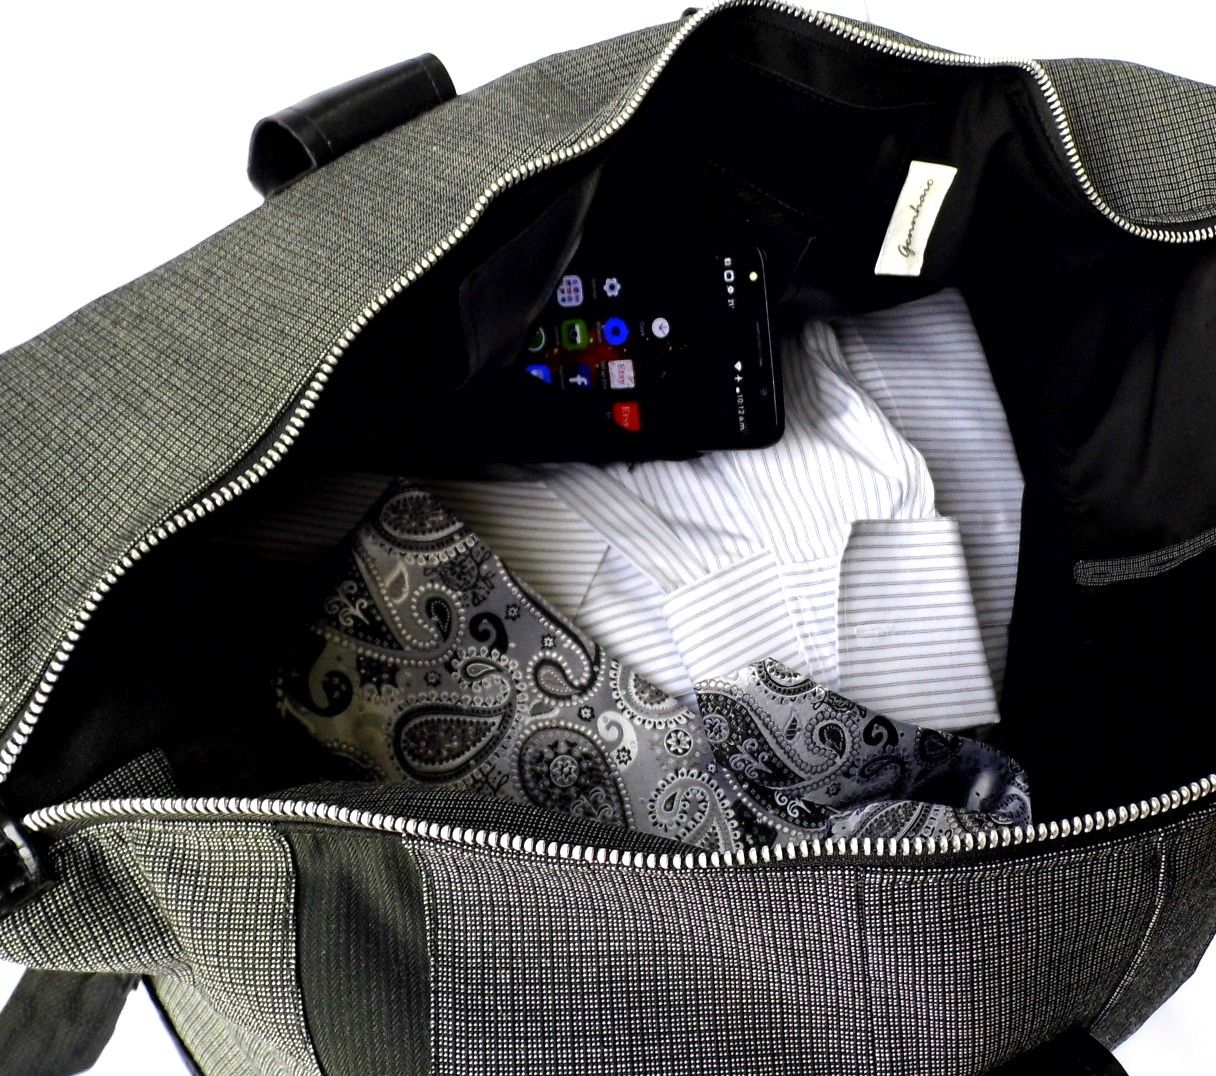 etsy giftsforher gennhaio handmadebags giftsforhim overnightbag weekenderbag